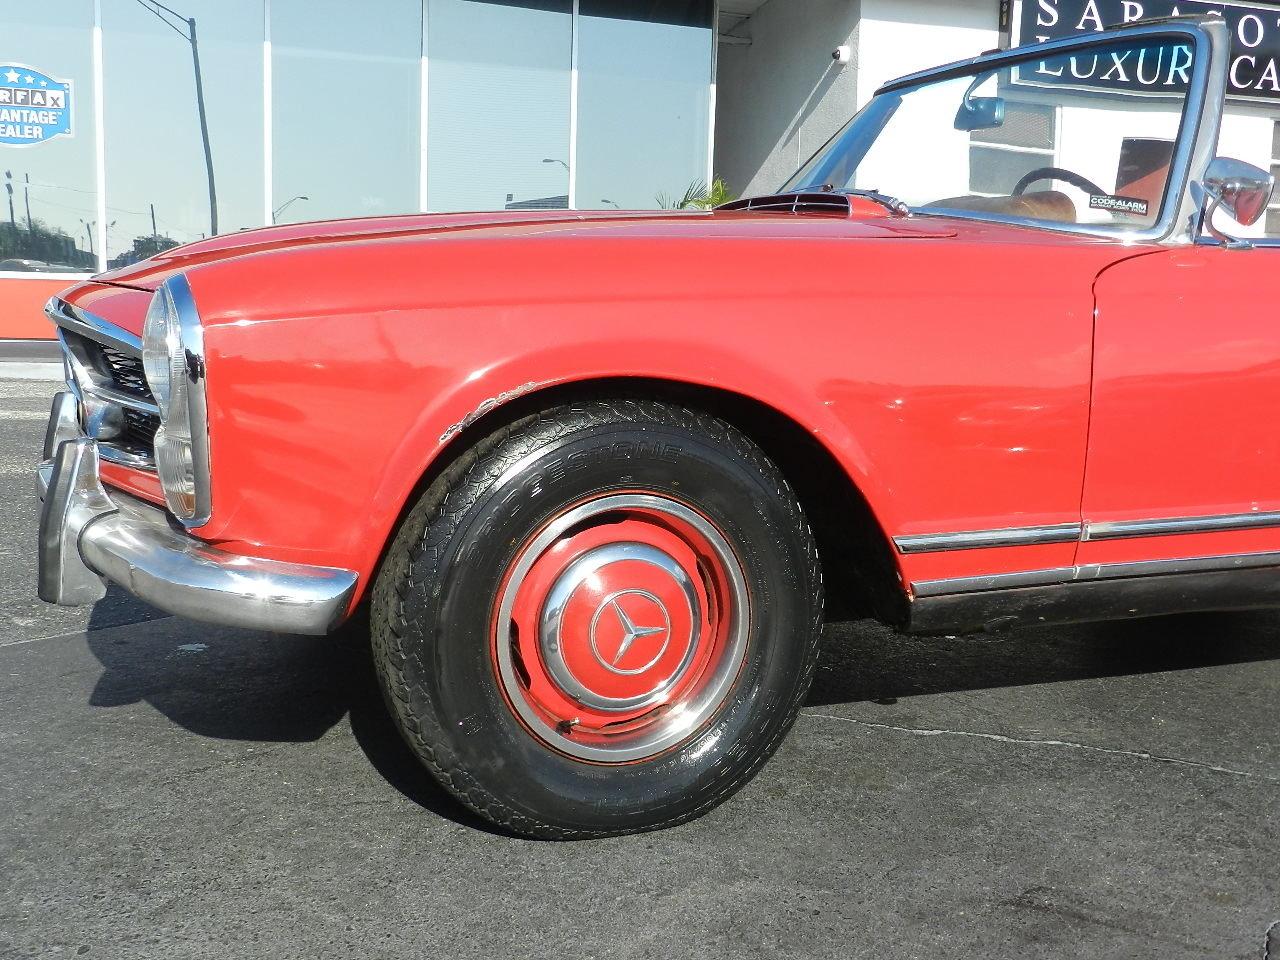 1967 mercedes benz 230sl pagoda for sale mercedes benz for Mercedes benz sarasota florida